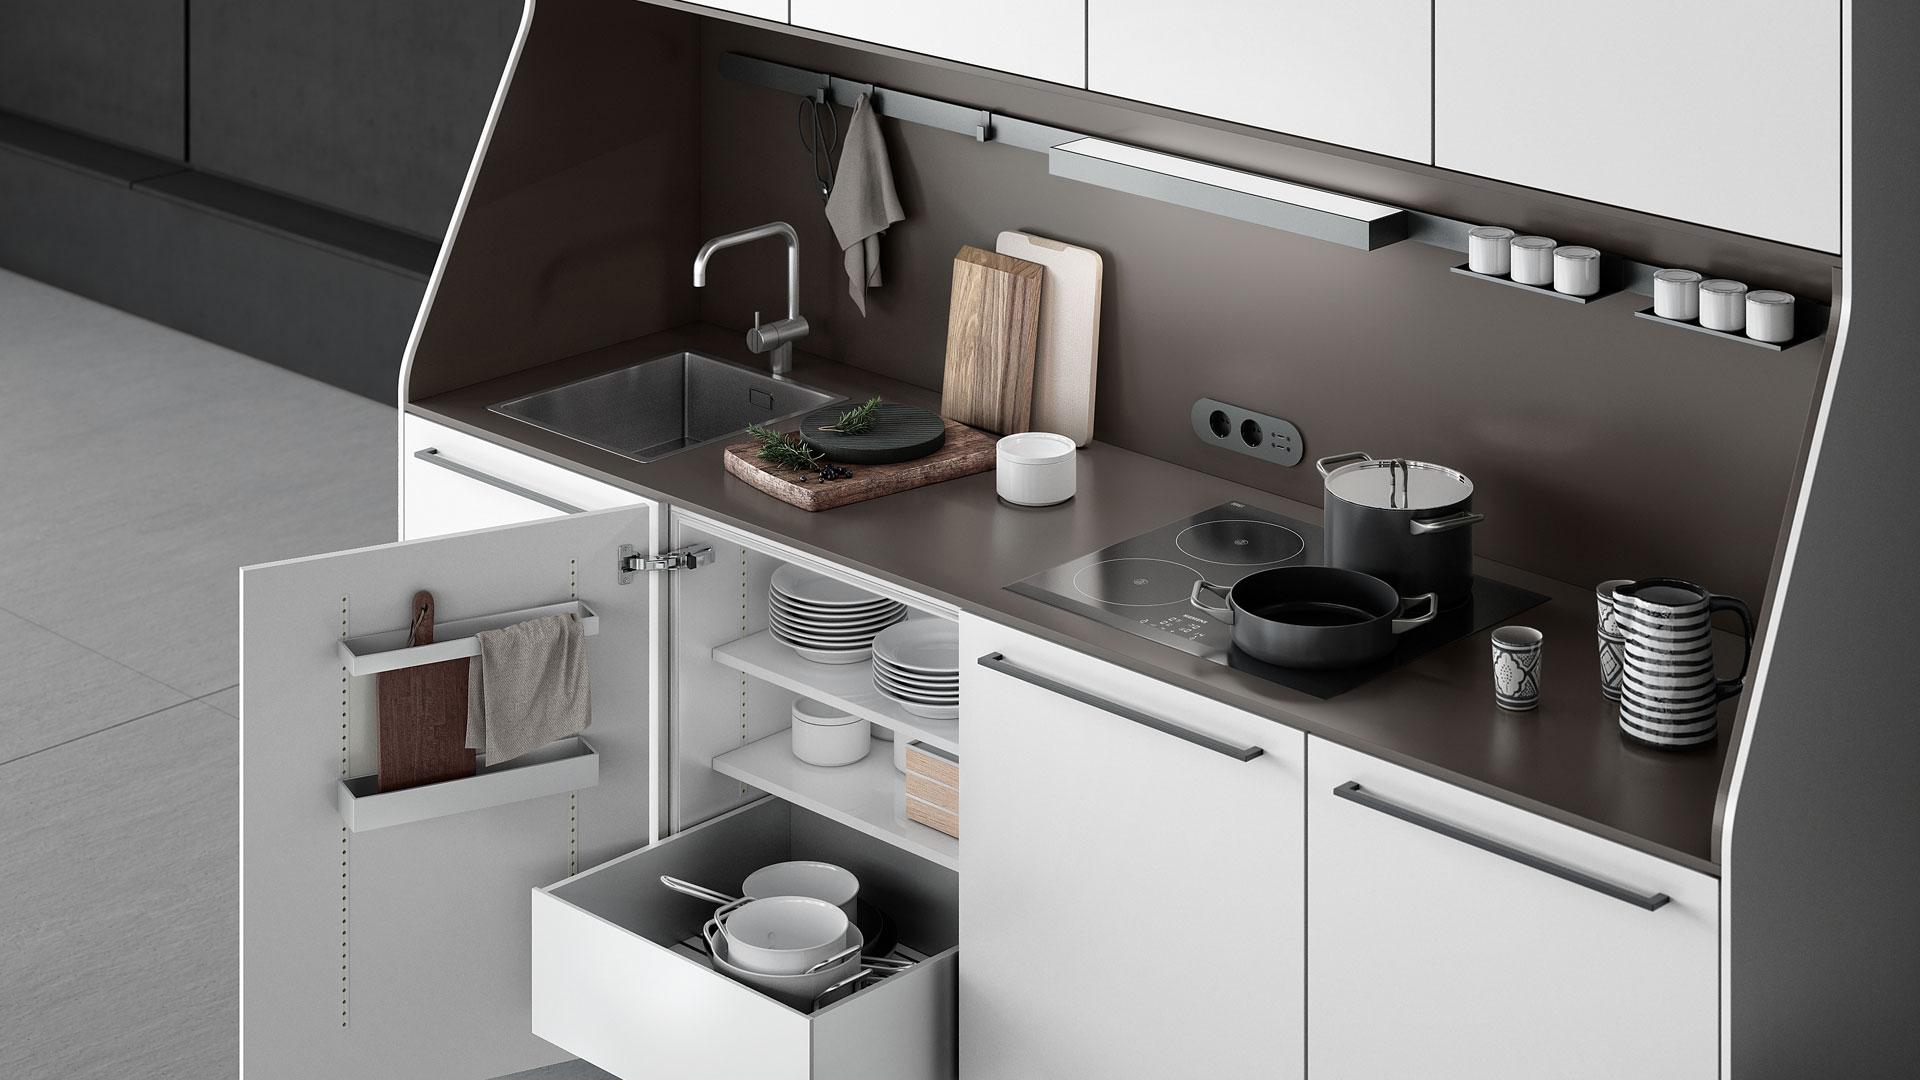 Kitchen Design Specialists | Design Your Dream Kitchen | A Bell